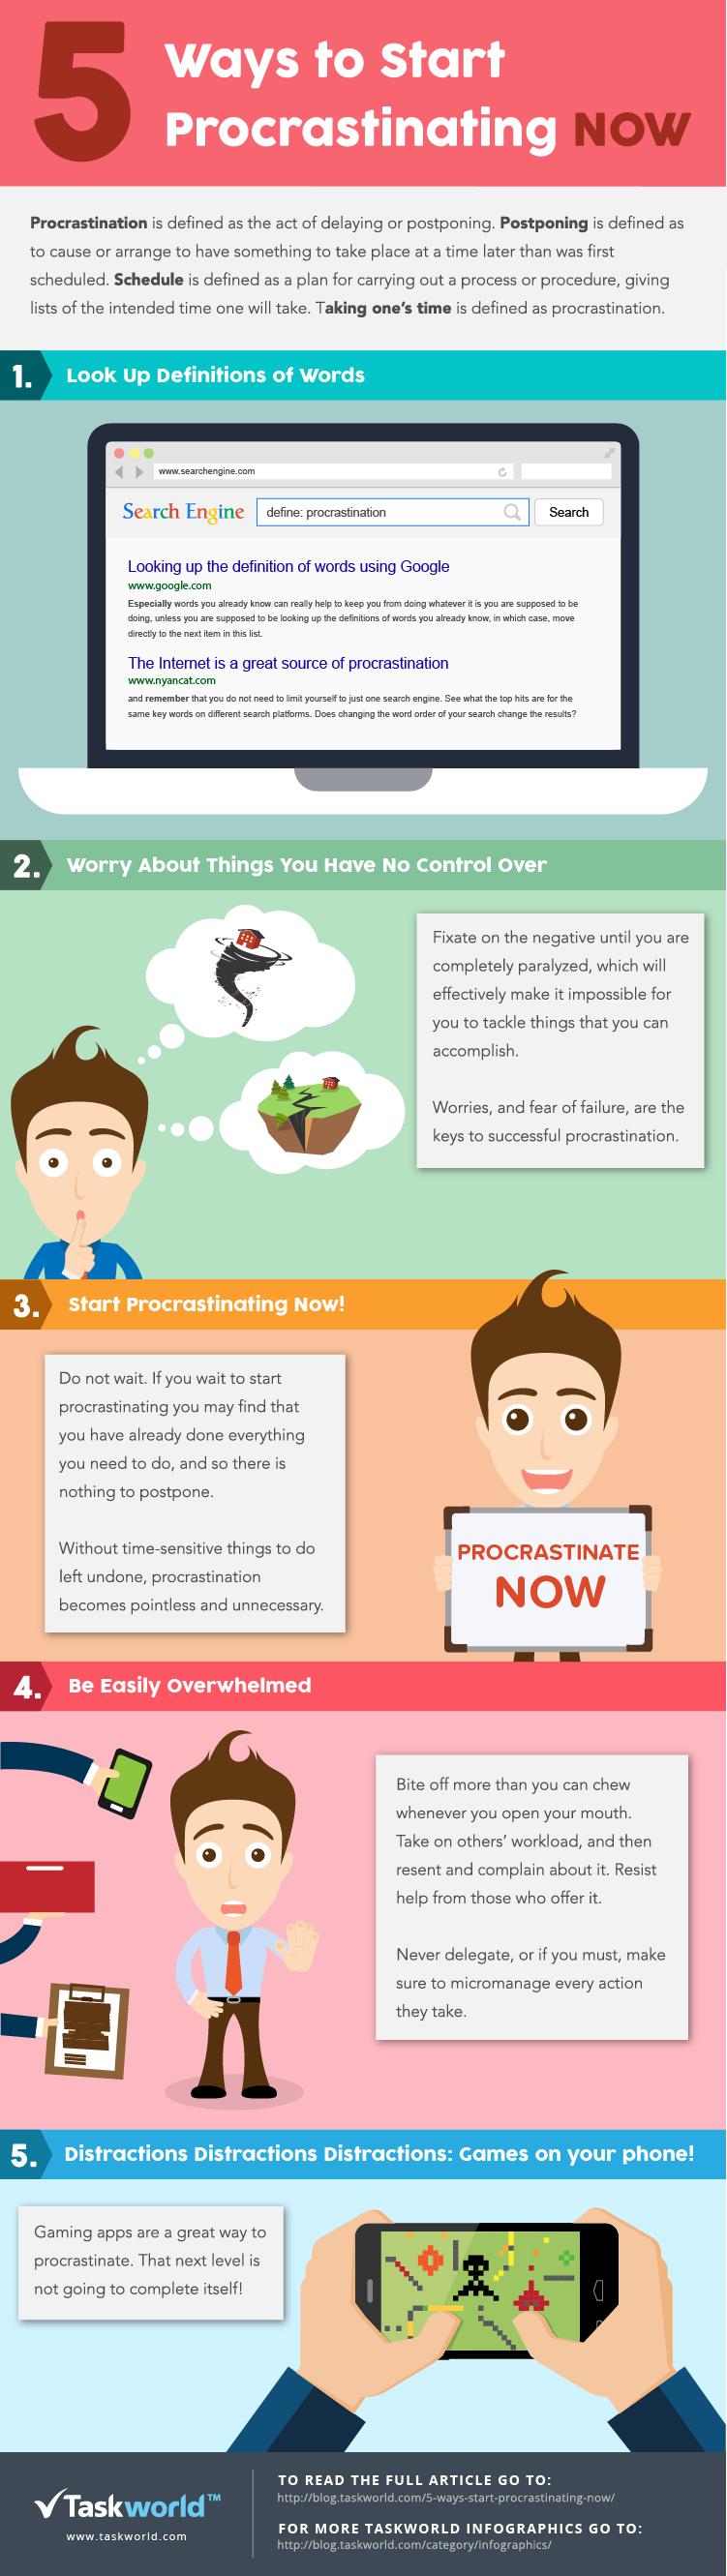 5-ways-to-procrastinate